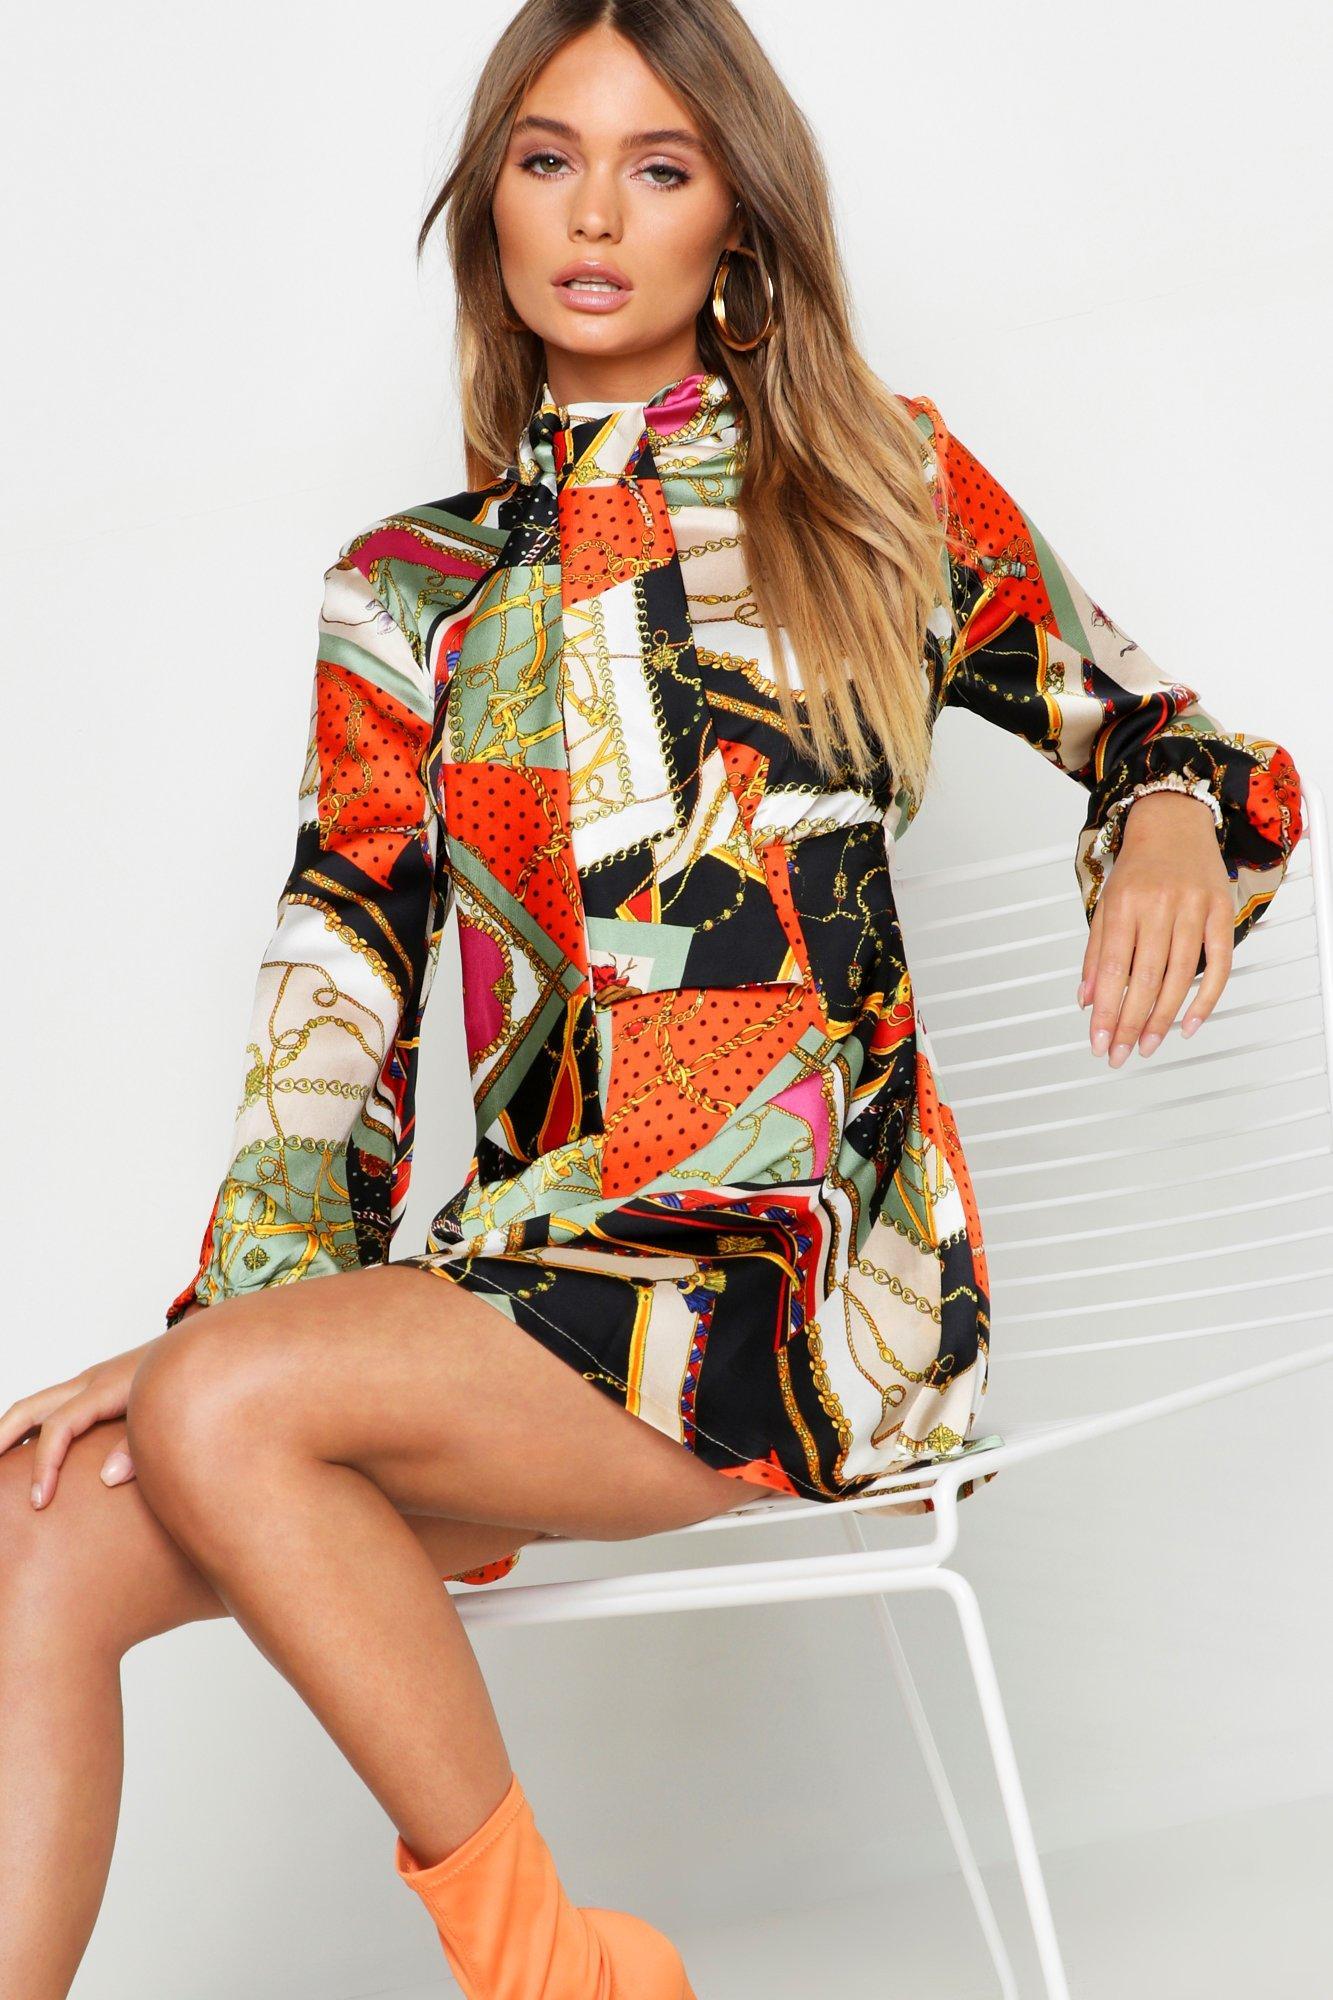 70s Dresses – Disco Dress, Hippie Dress, Wrap Dress Womens Tie Neck Chain Print Skater Dress - Orange - 12 $38.00 AT vintagedancer.com